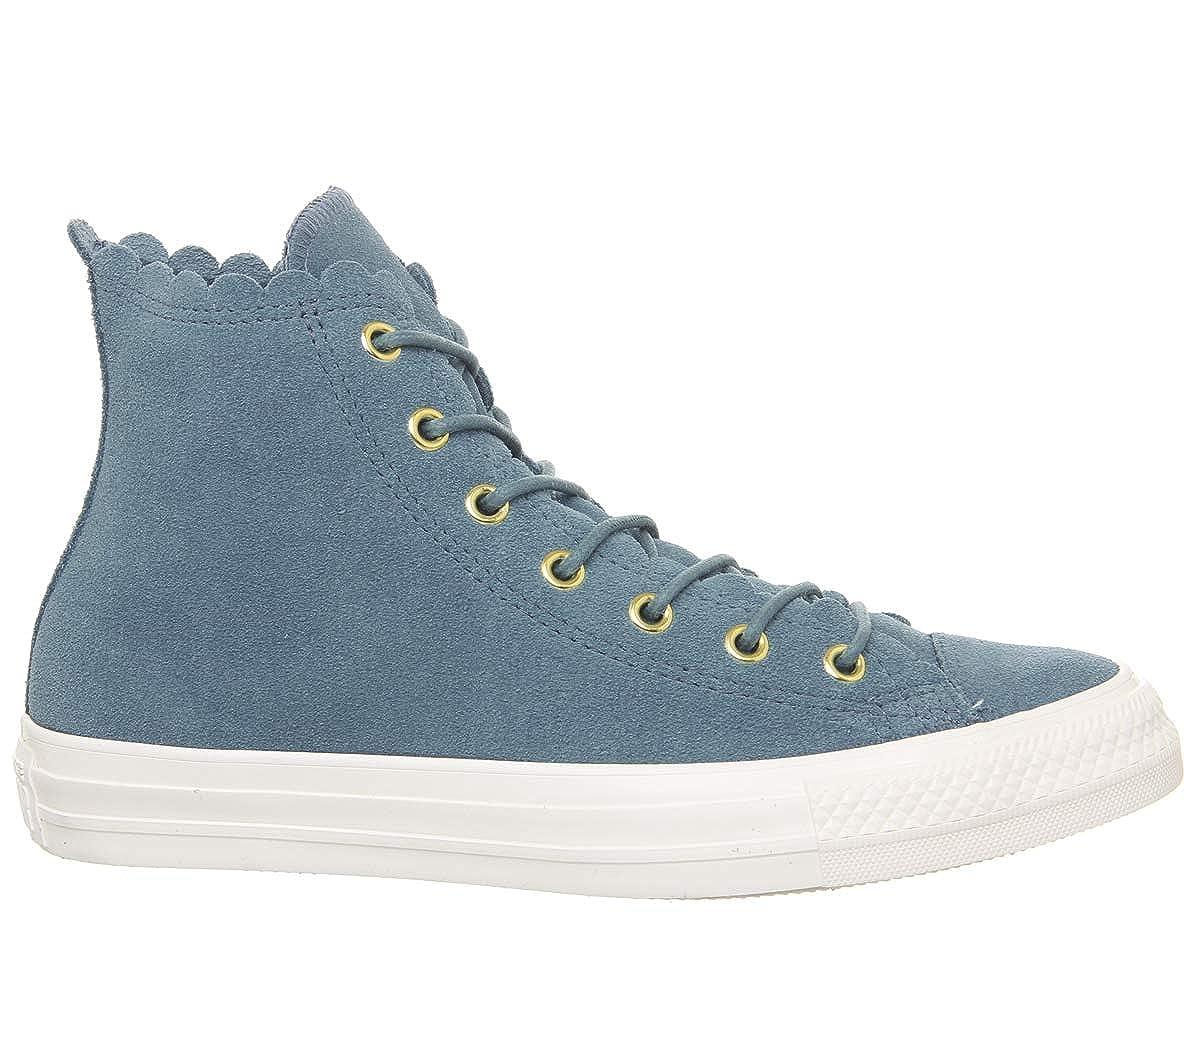 CONVERSE Designer Chucks Schuhe Schuhe Schuhe - ALL STAR -  ad429e